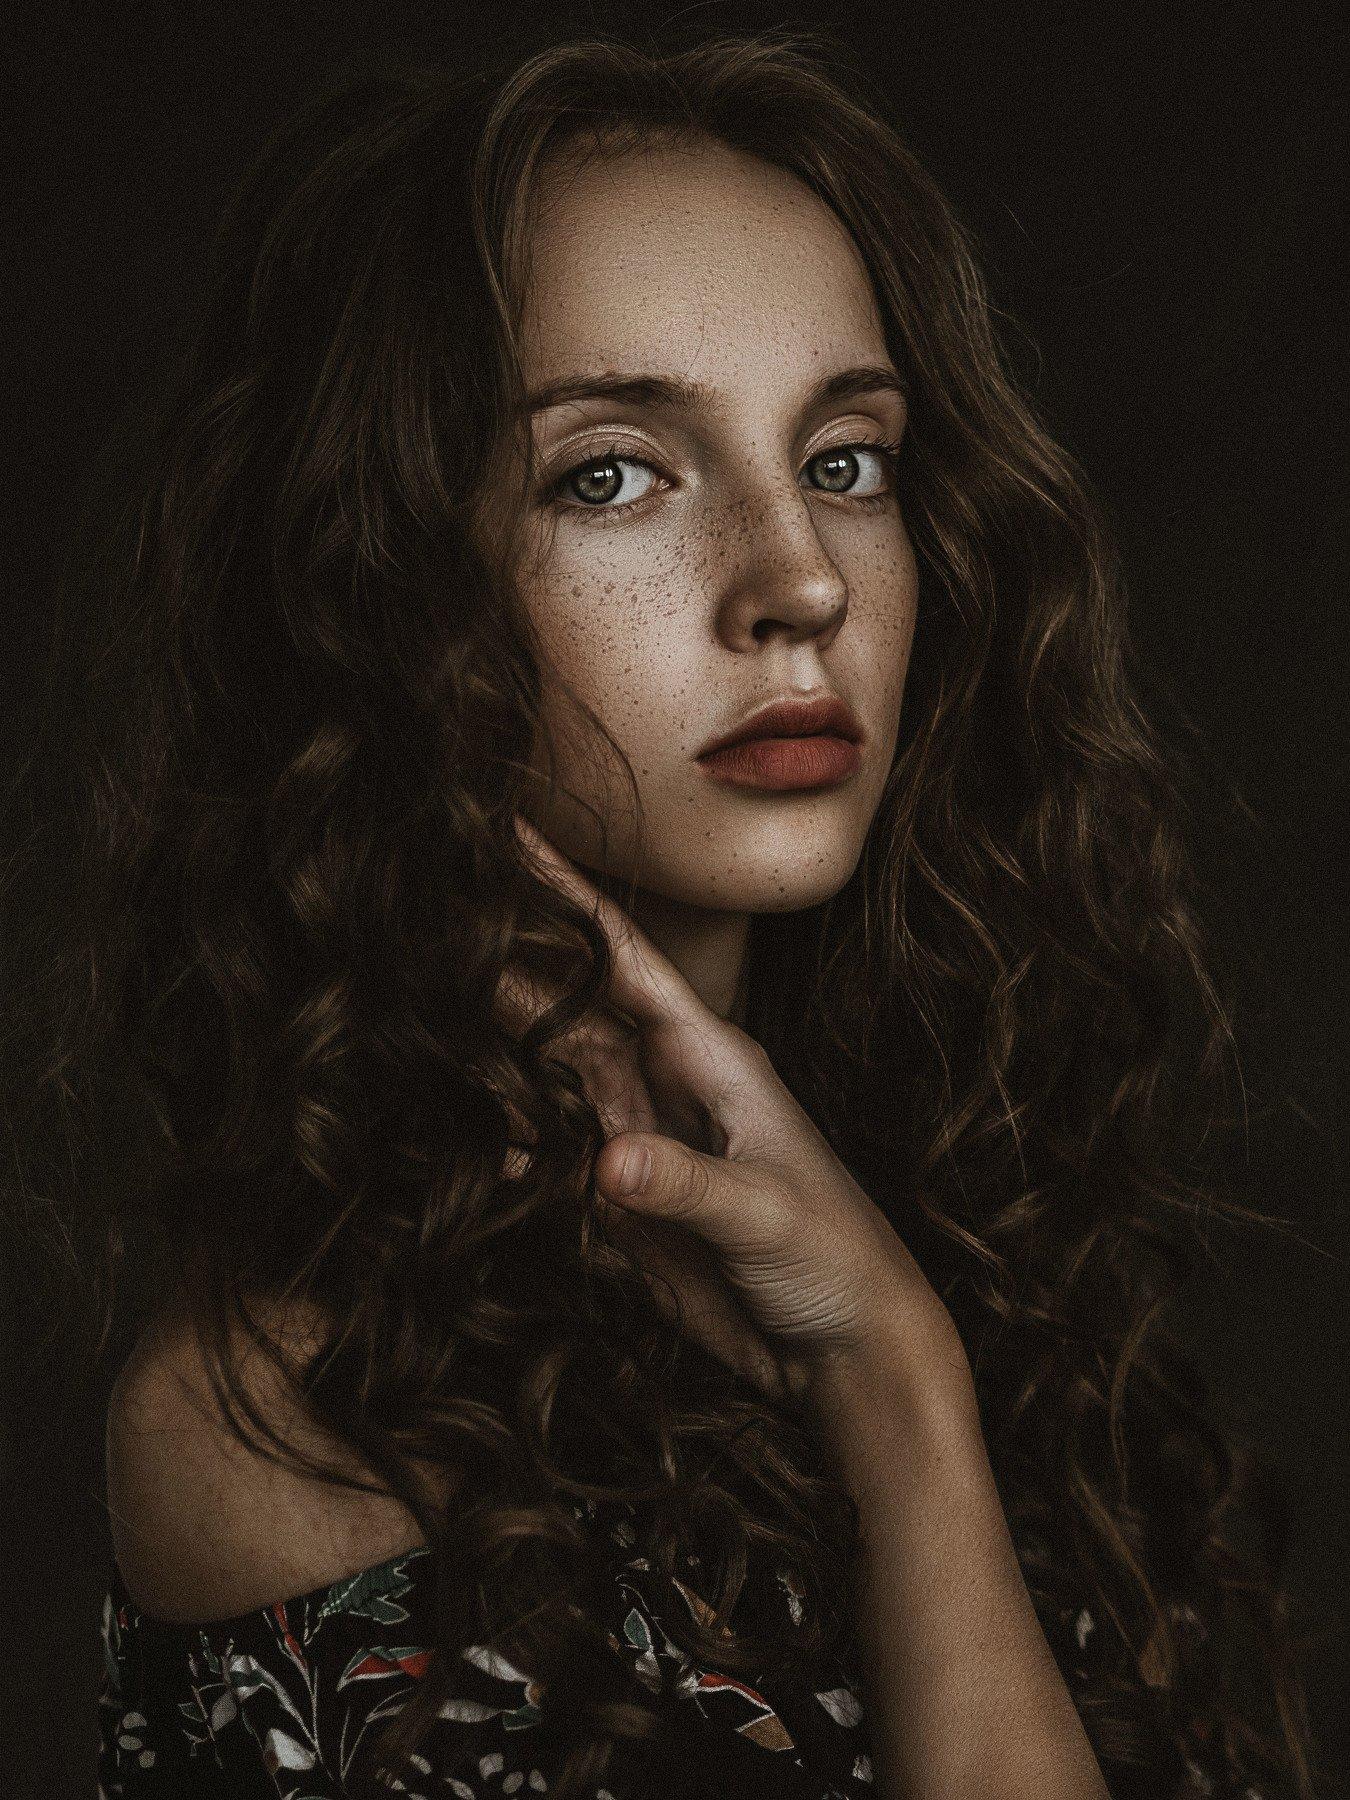 portrait, fineart, retouch, high end, girl, eyes, hair, freckles, Krzysiek Śliwaq